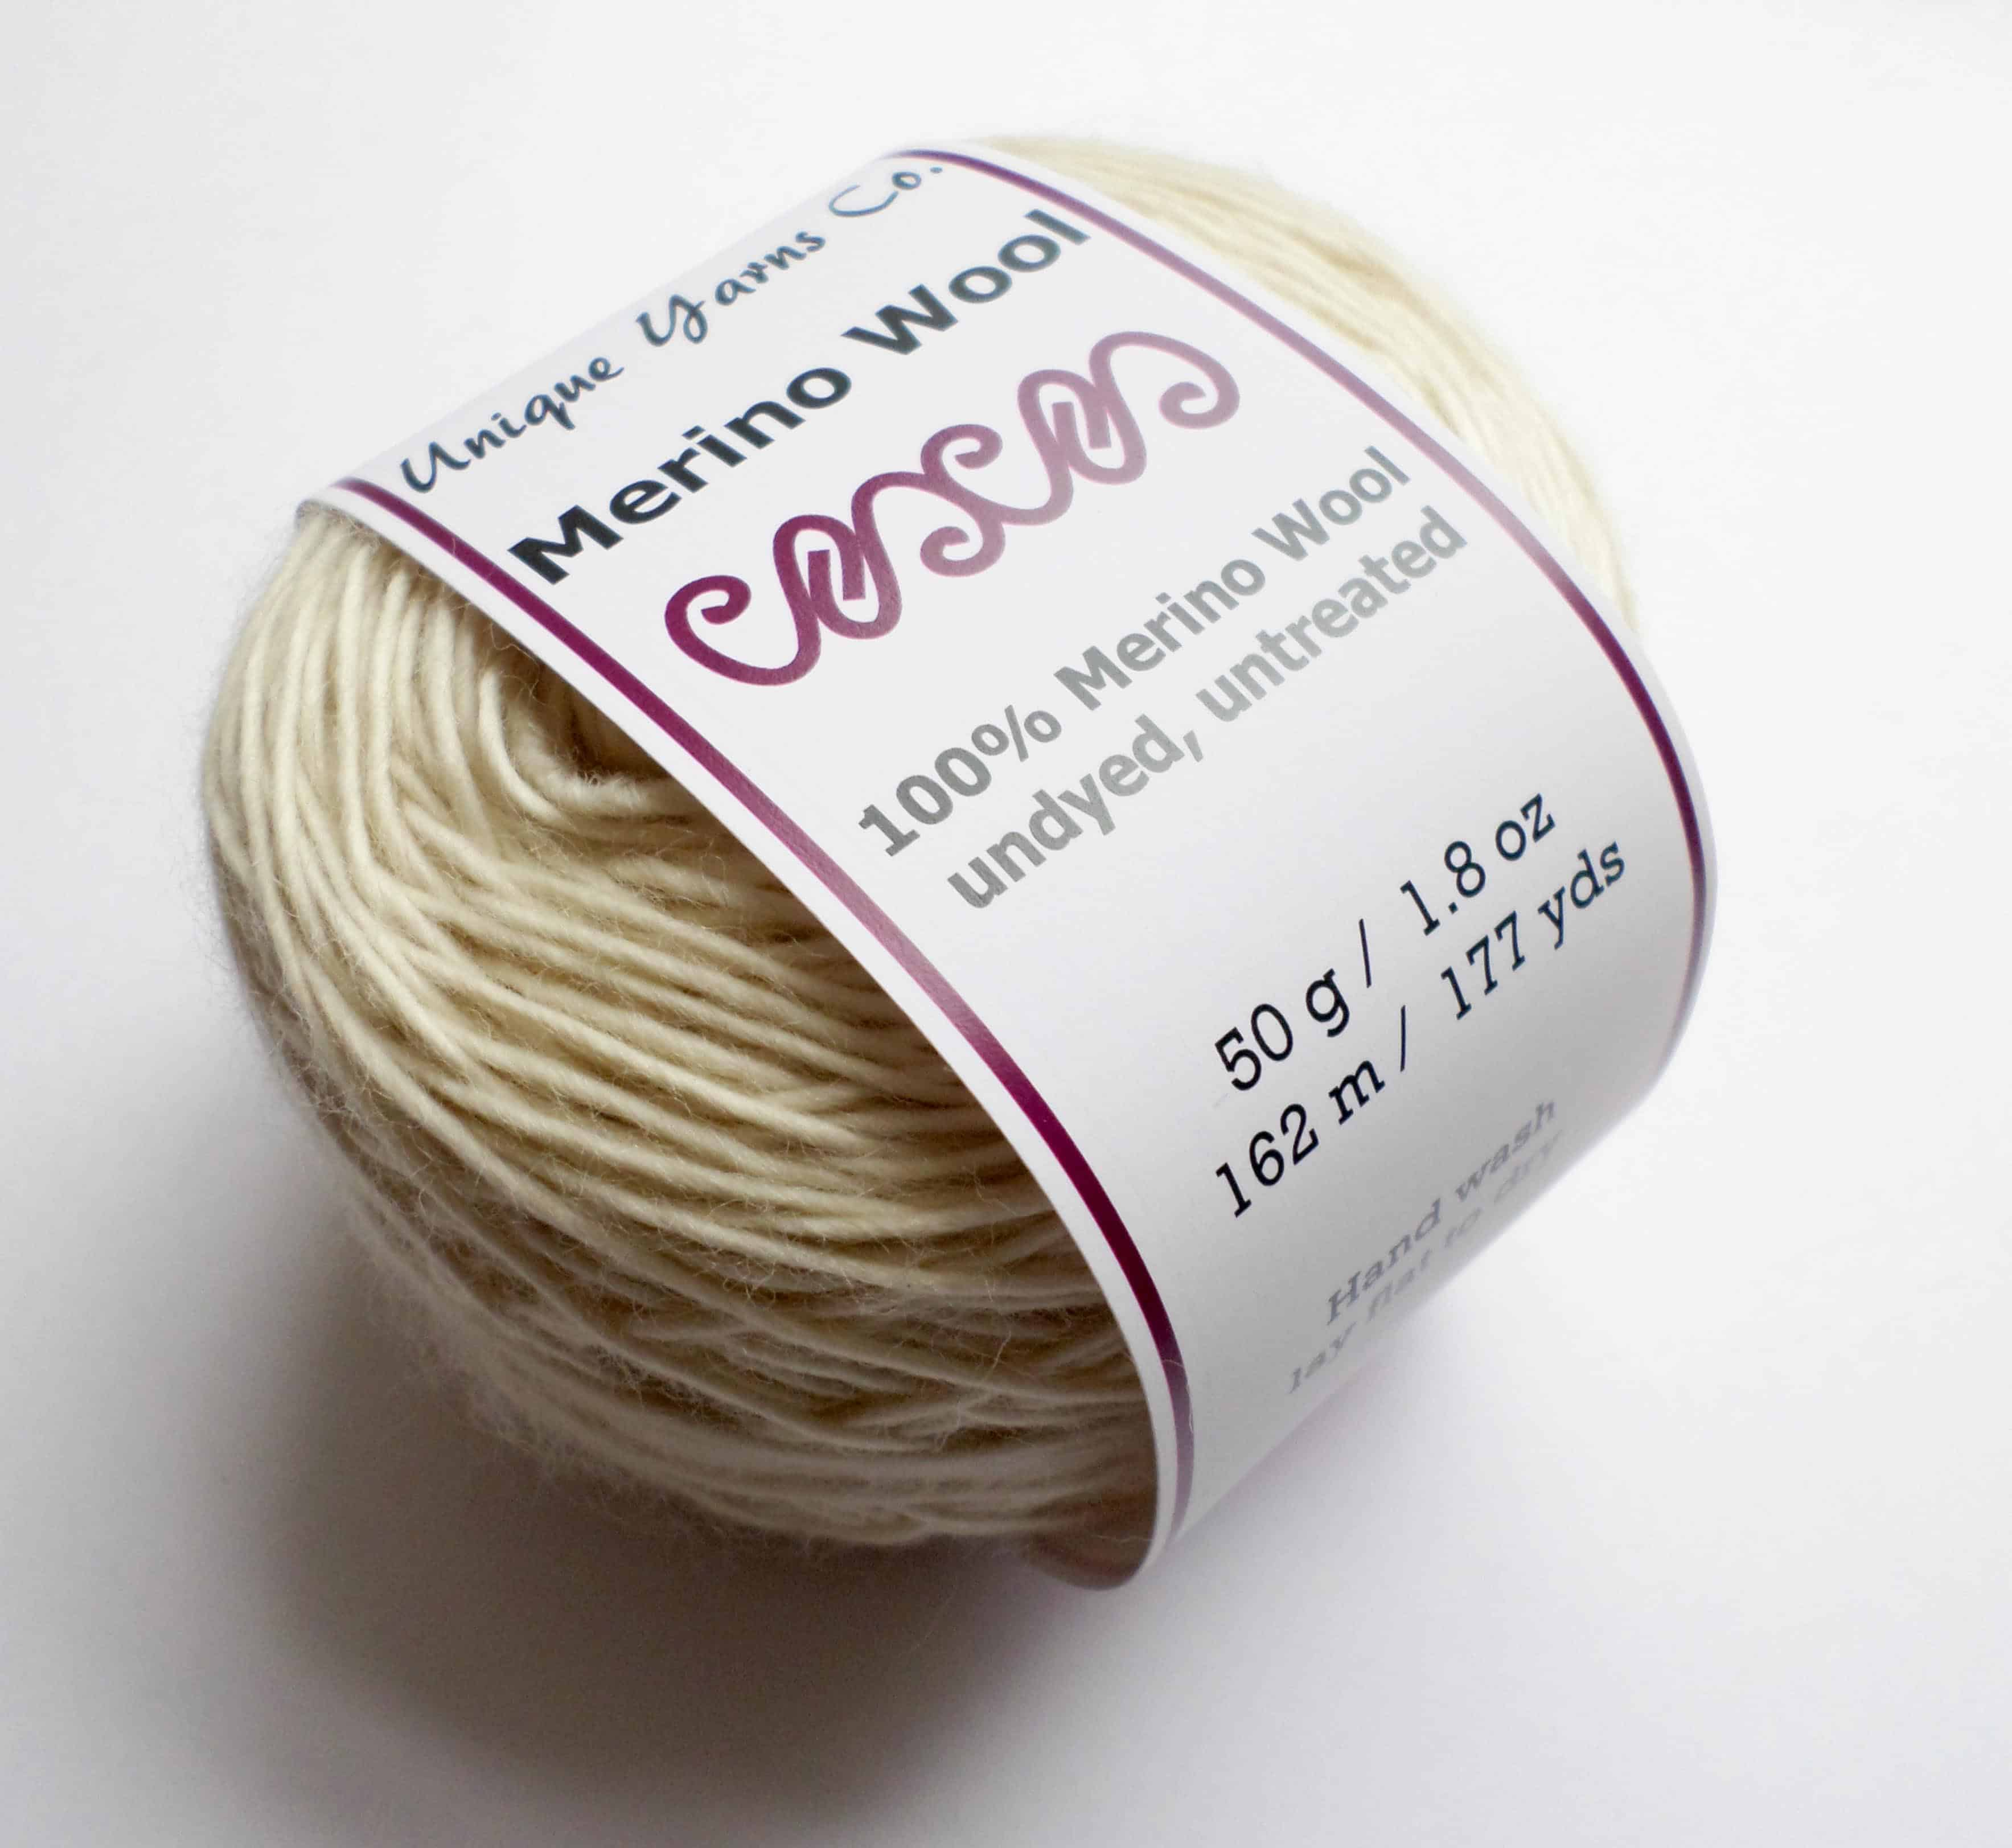 Undyed Natural 100% Merino Wool